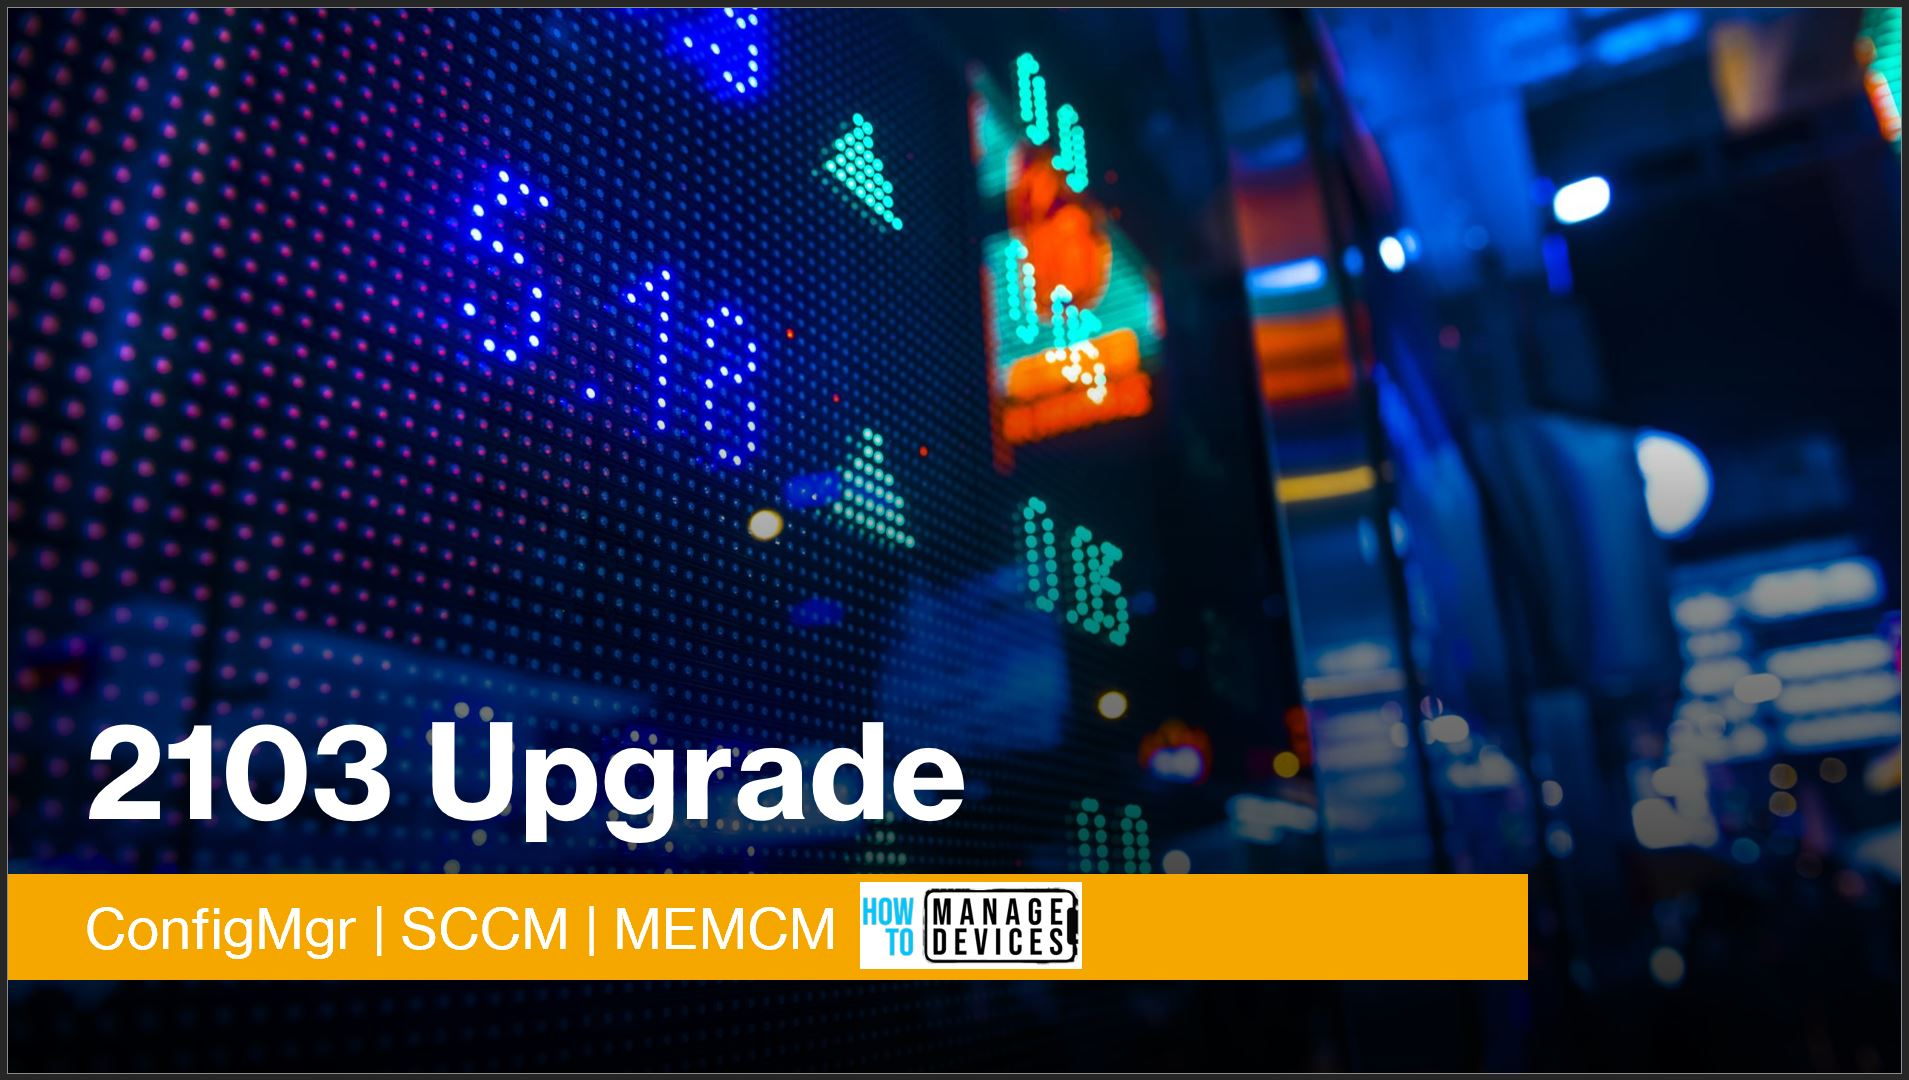 ConfigMgr 2103 Upgrade